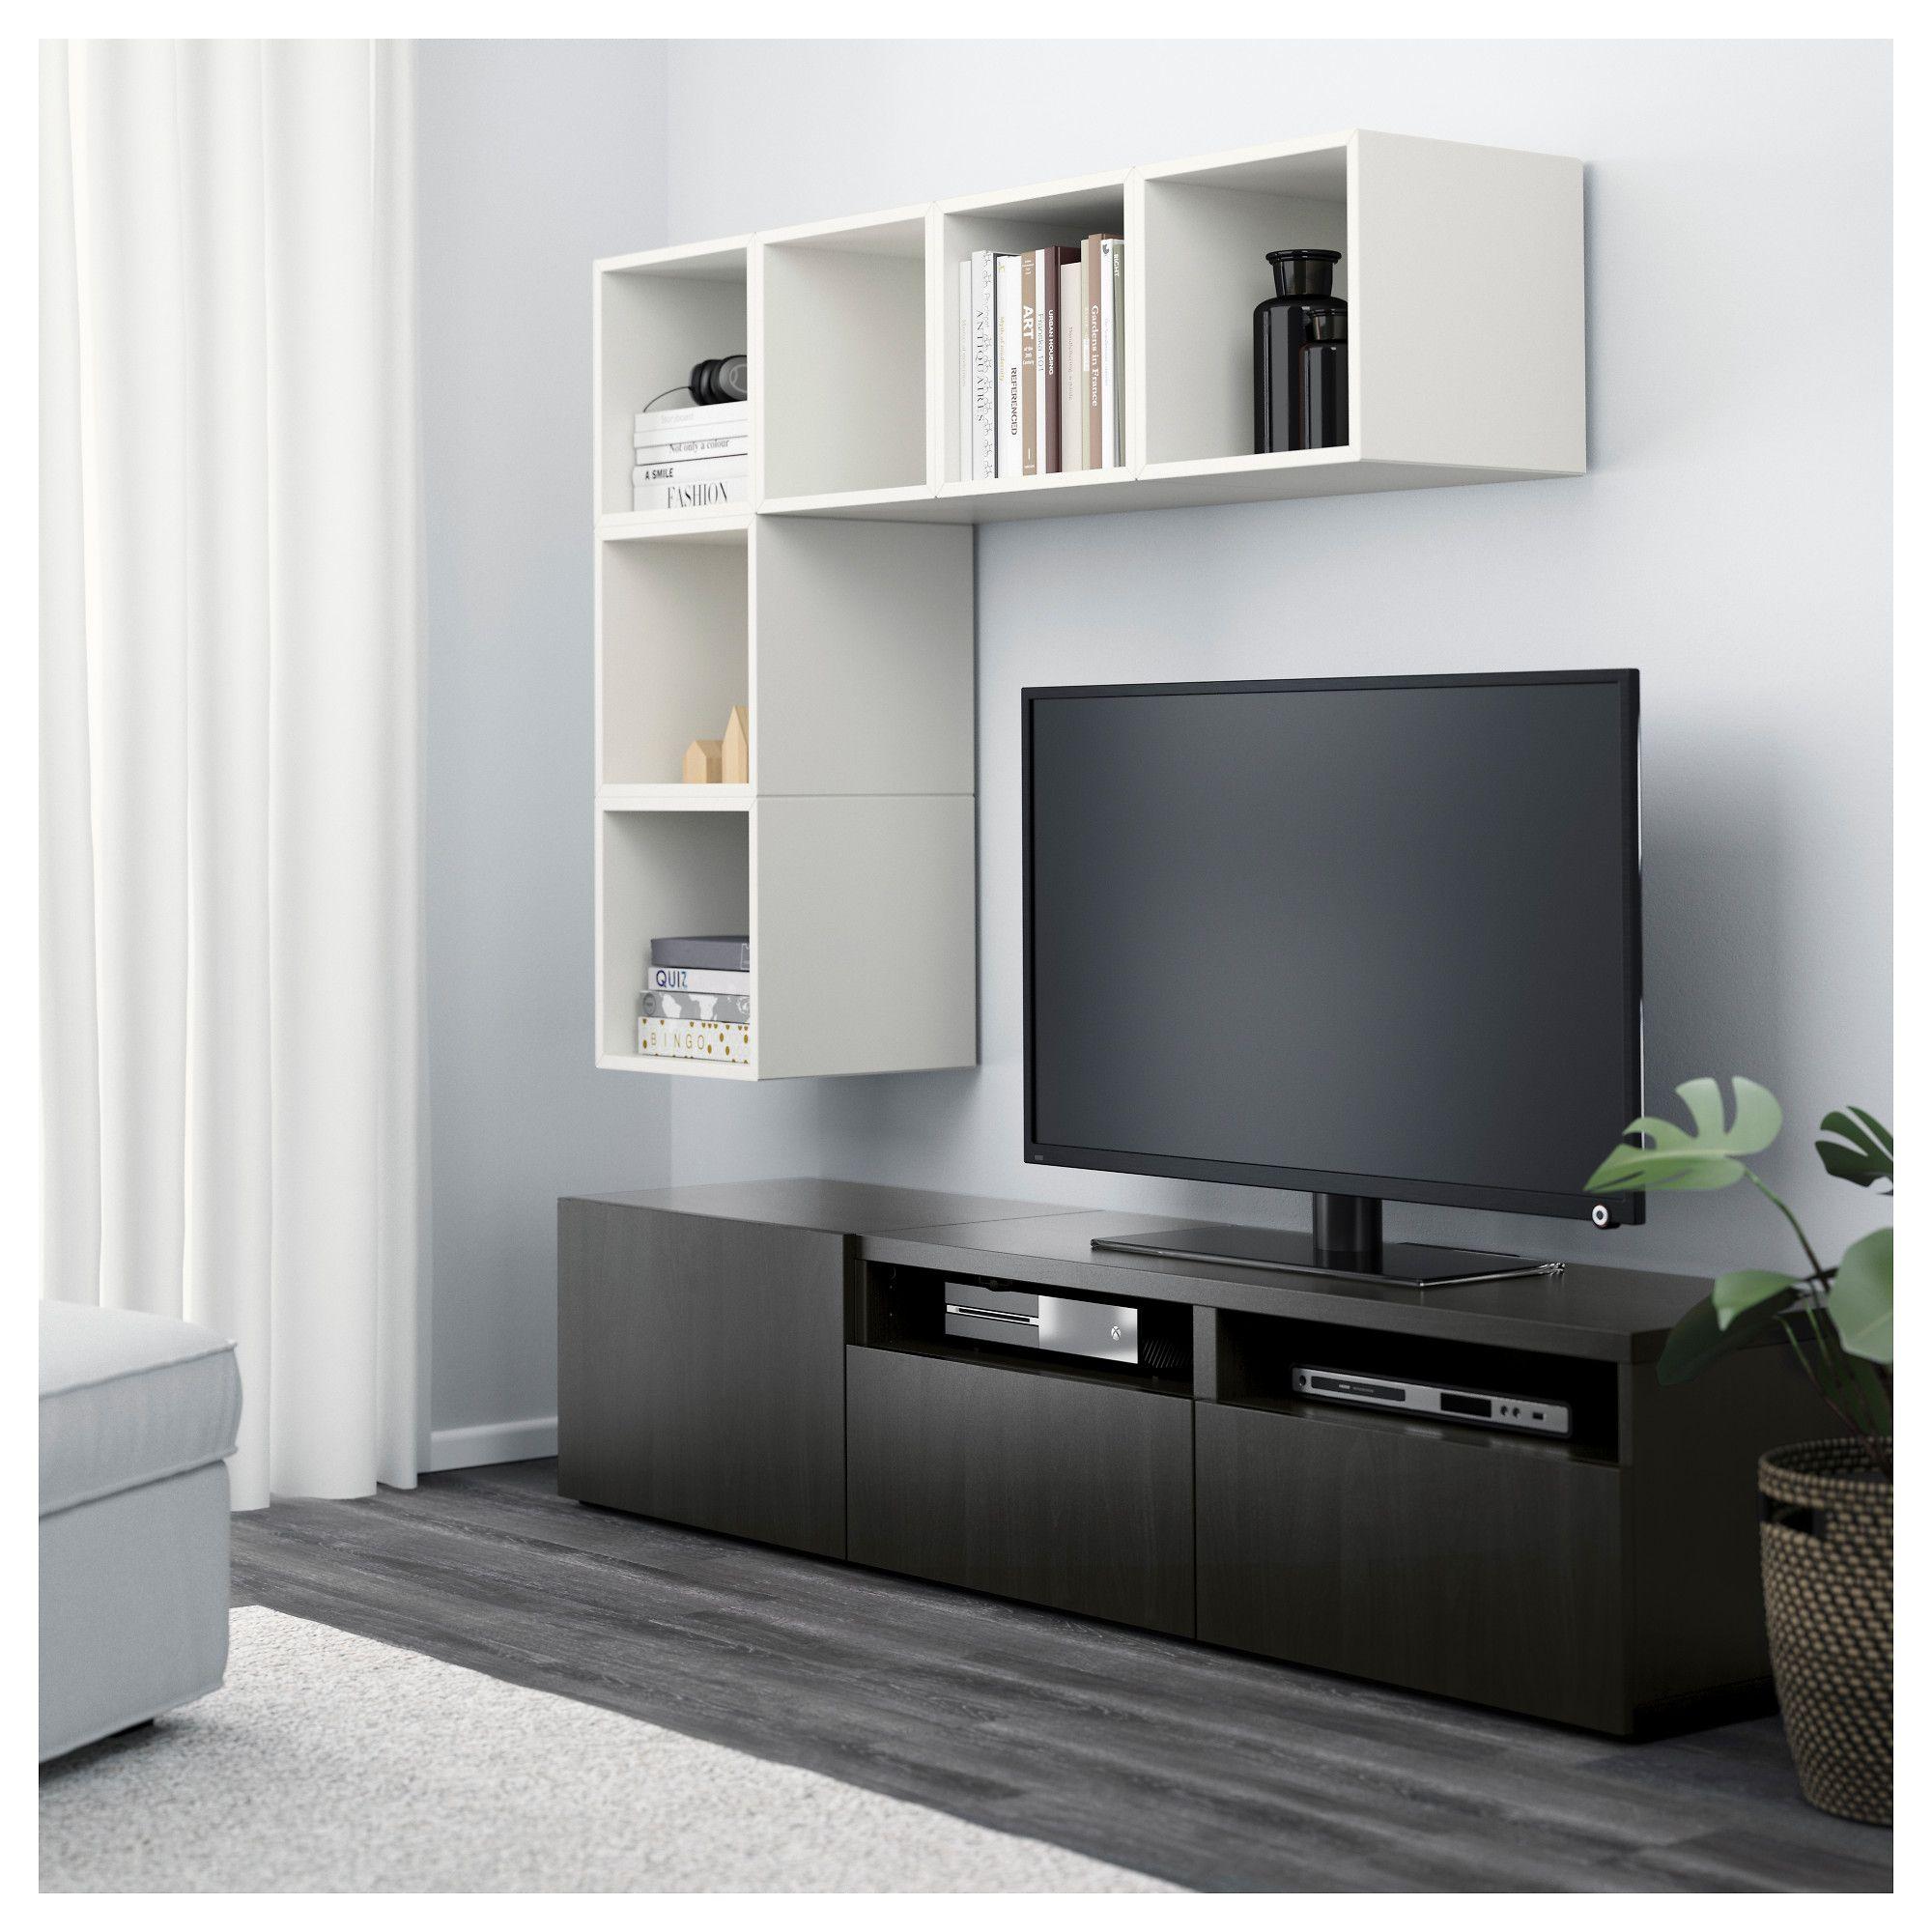 Meuble Tv Colonne Ikea ikea - bestÅ / eket tv storage combination white/black-brown